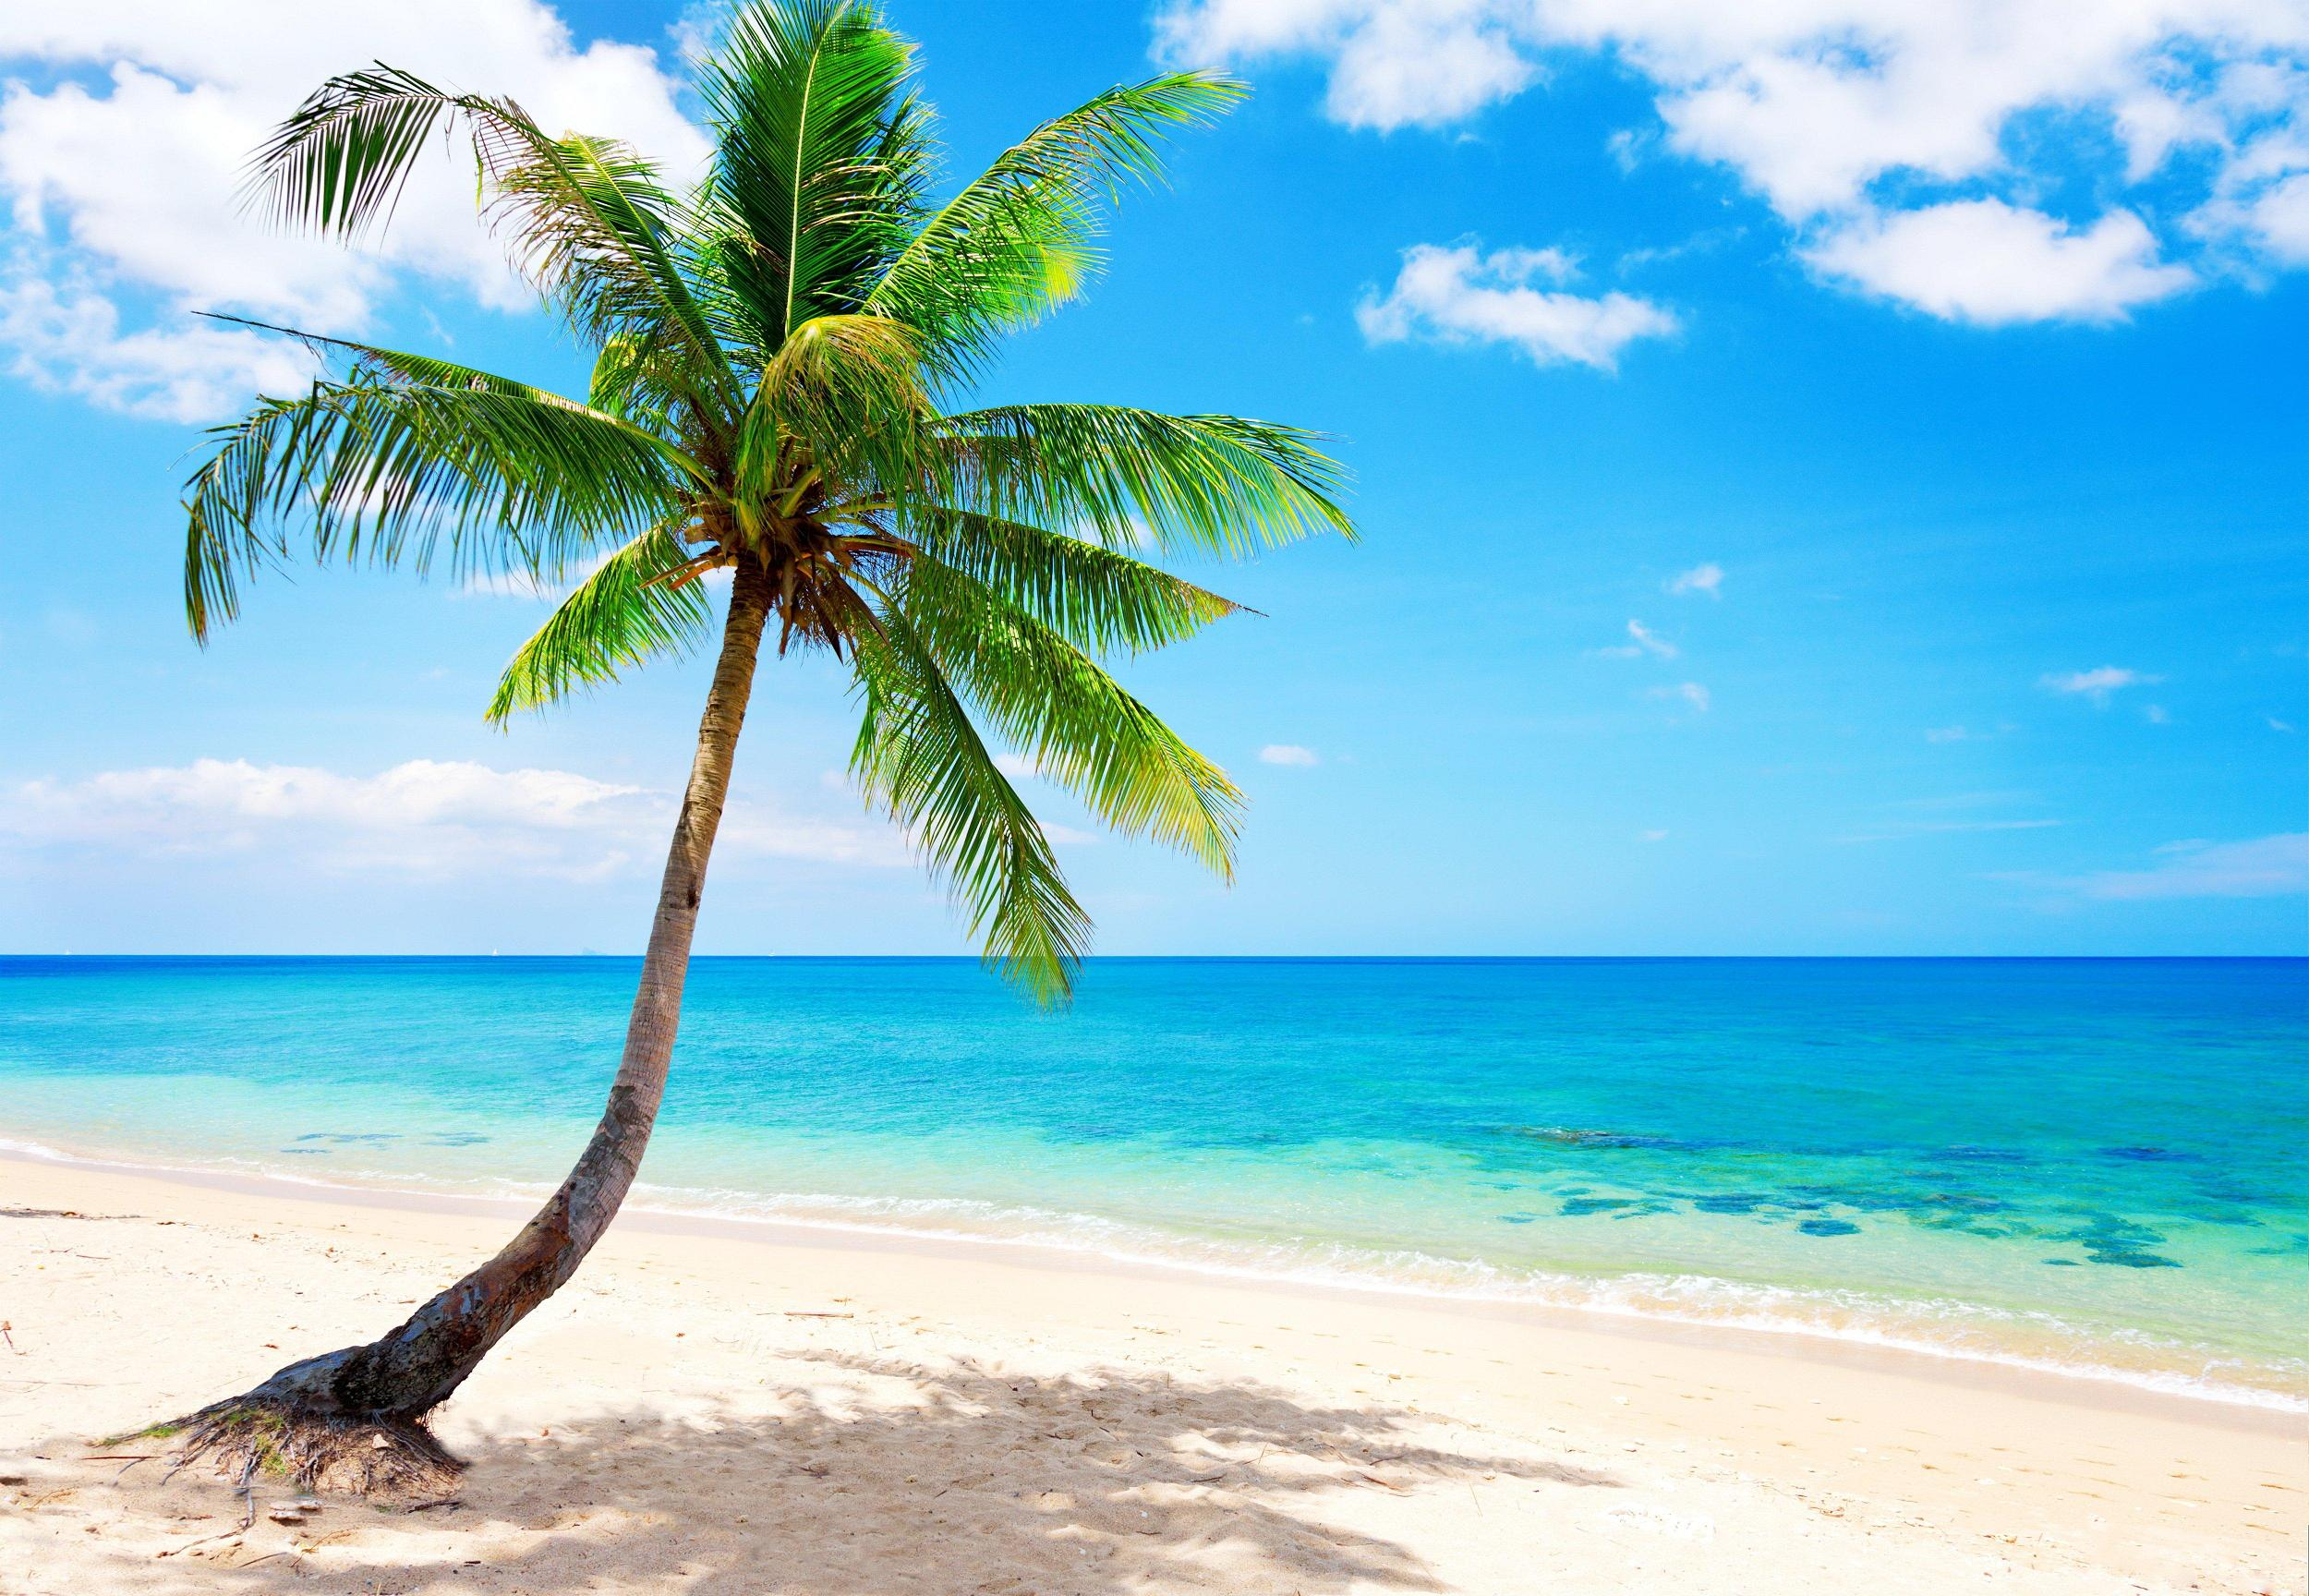 берег камни пальмы shore stones palm trees  № 792068 бесплатно